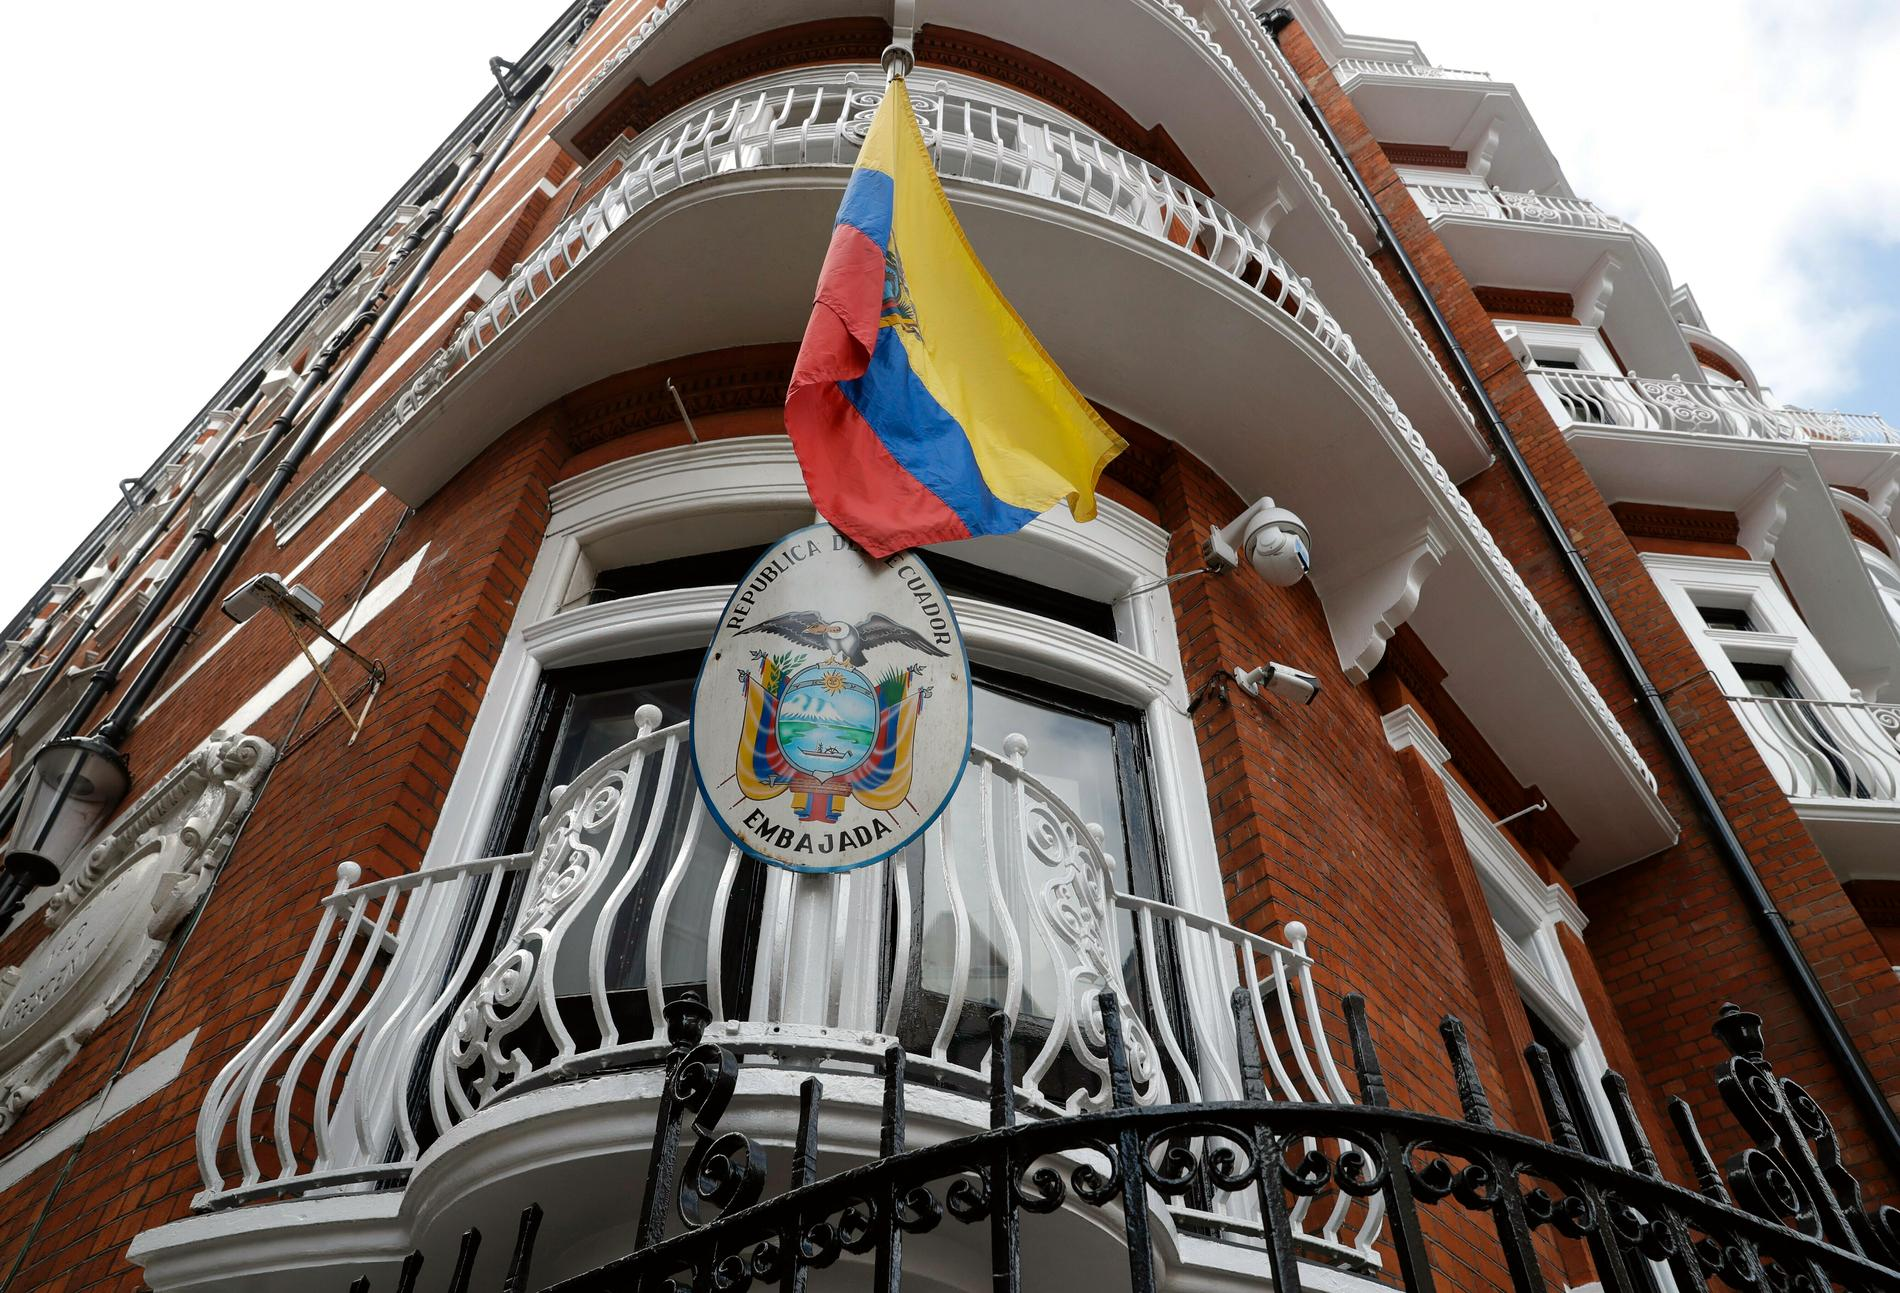 Wikileaksgrundaren Julian Assange bodde på Ecuadors ambassad i London i flera år. Arkivbild.